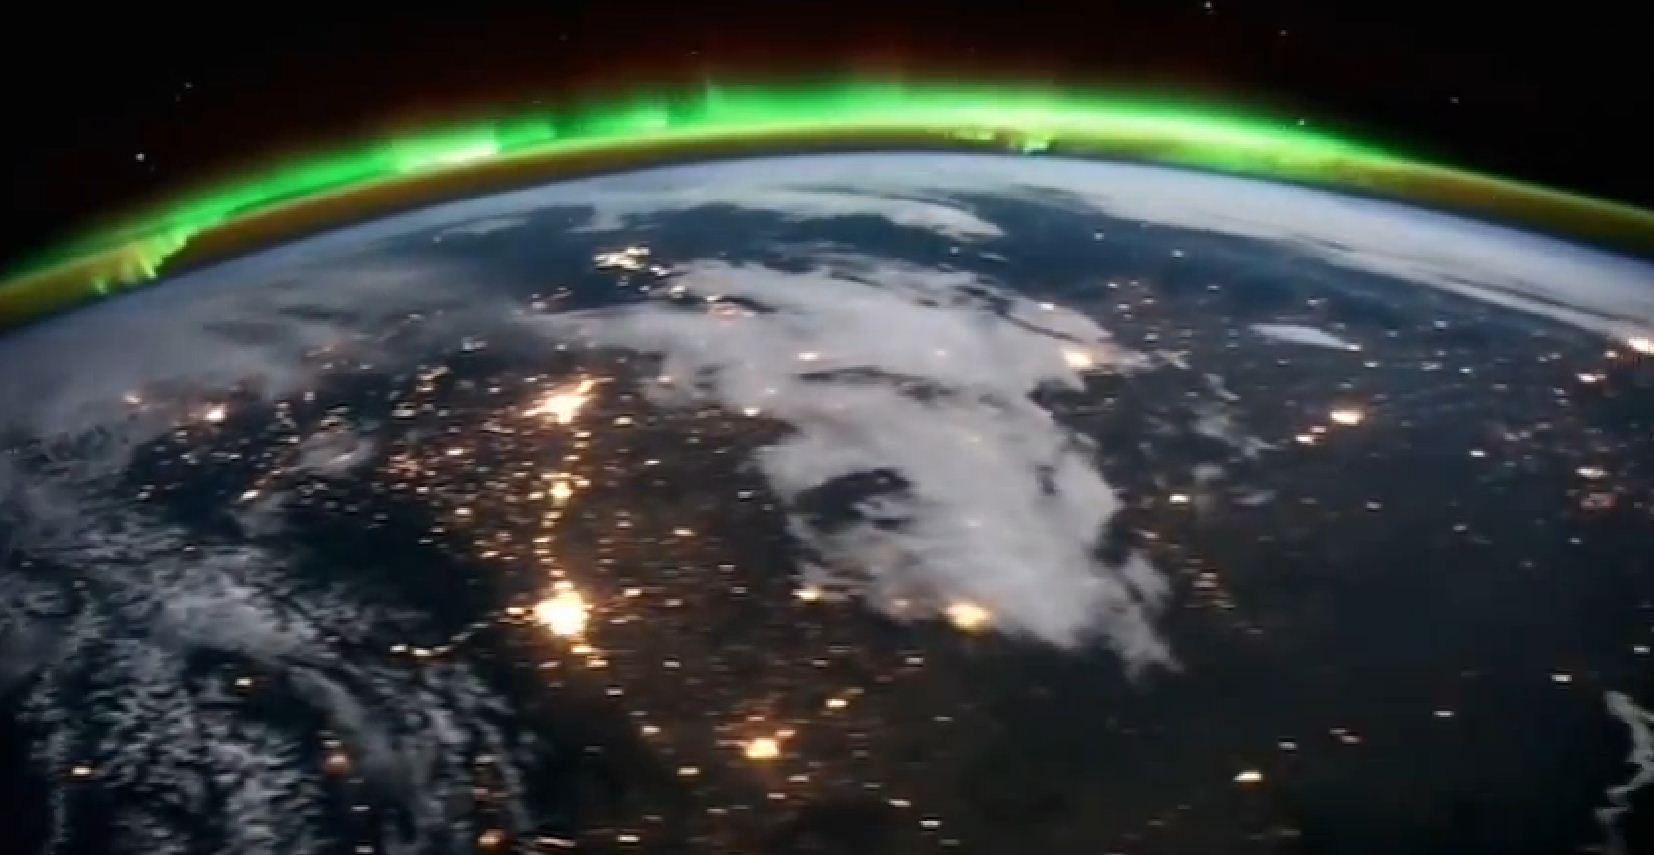 nasa northern lights forecast 2017 - photo #24